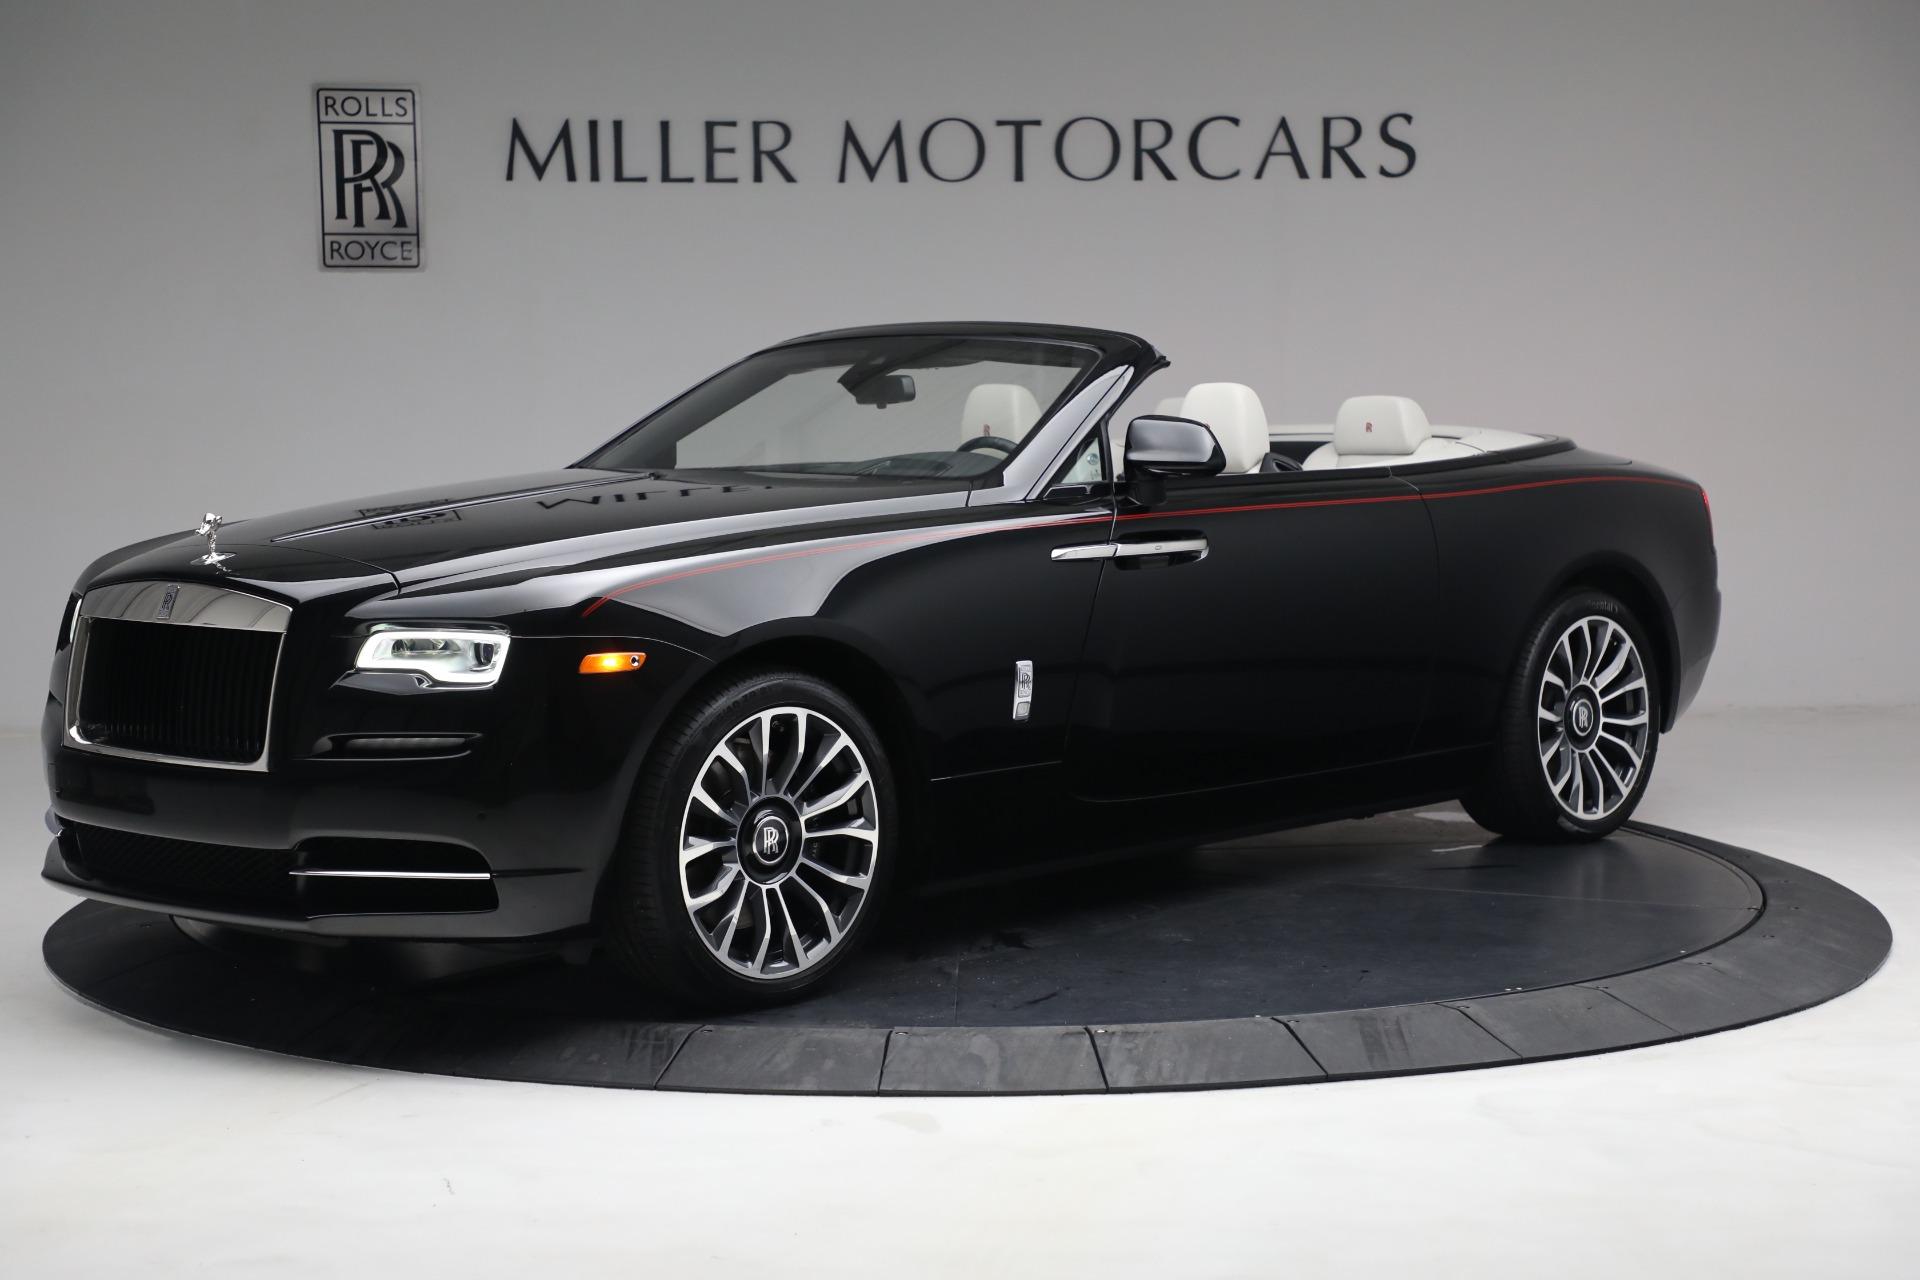 Used 2019 Rolls-Royce Dawn for sale $379,900 at Bugatti of Greenwich in Greenwich CT 06830 1